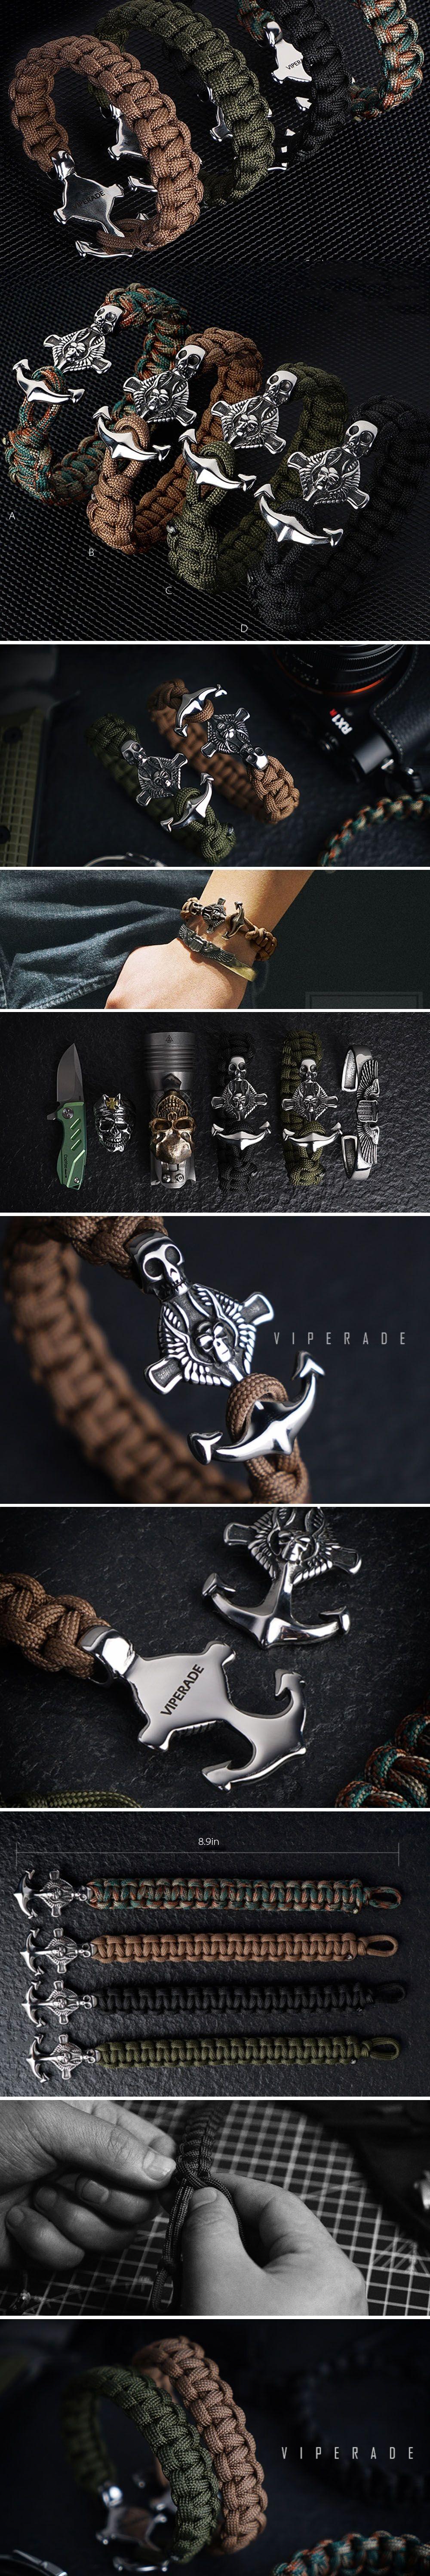 Viperade Multifunctional Outdoor Anchor Survival Bracelet Survival Collection